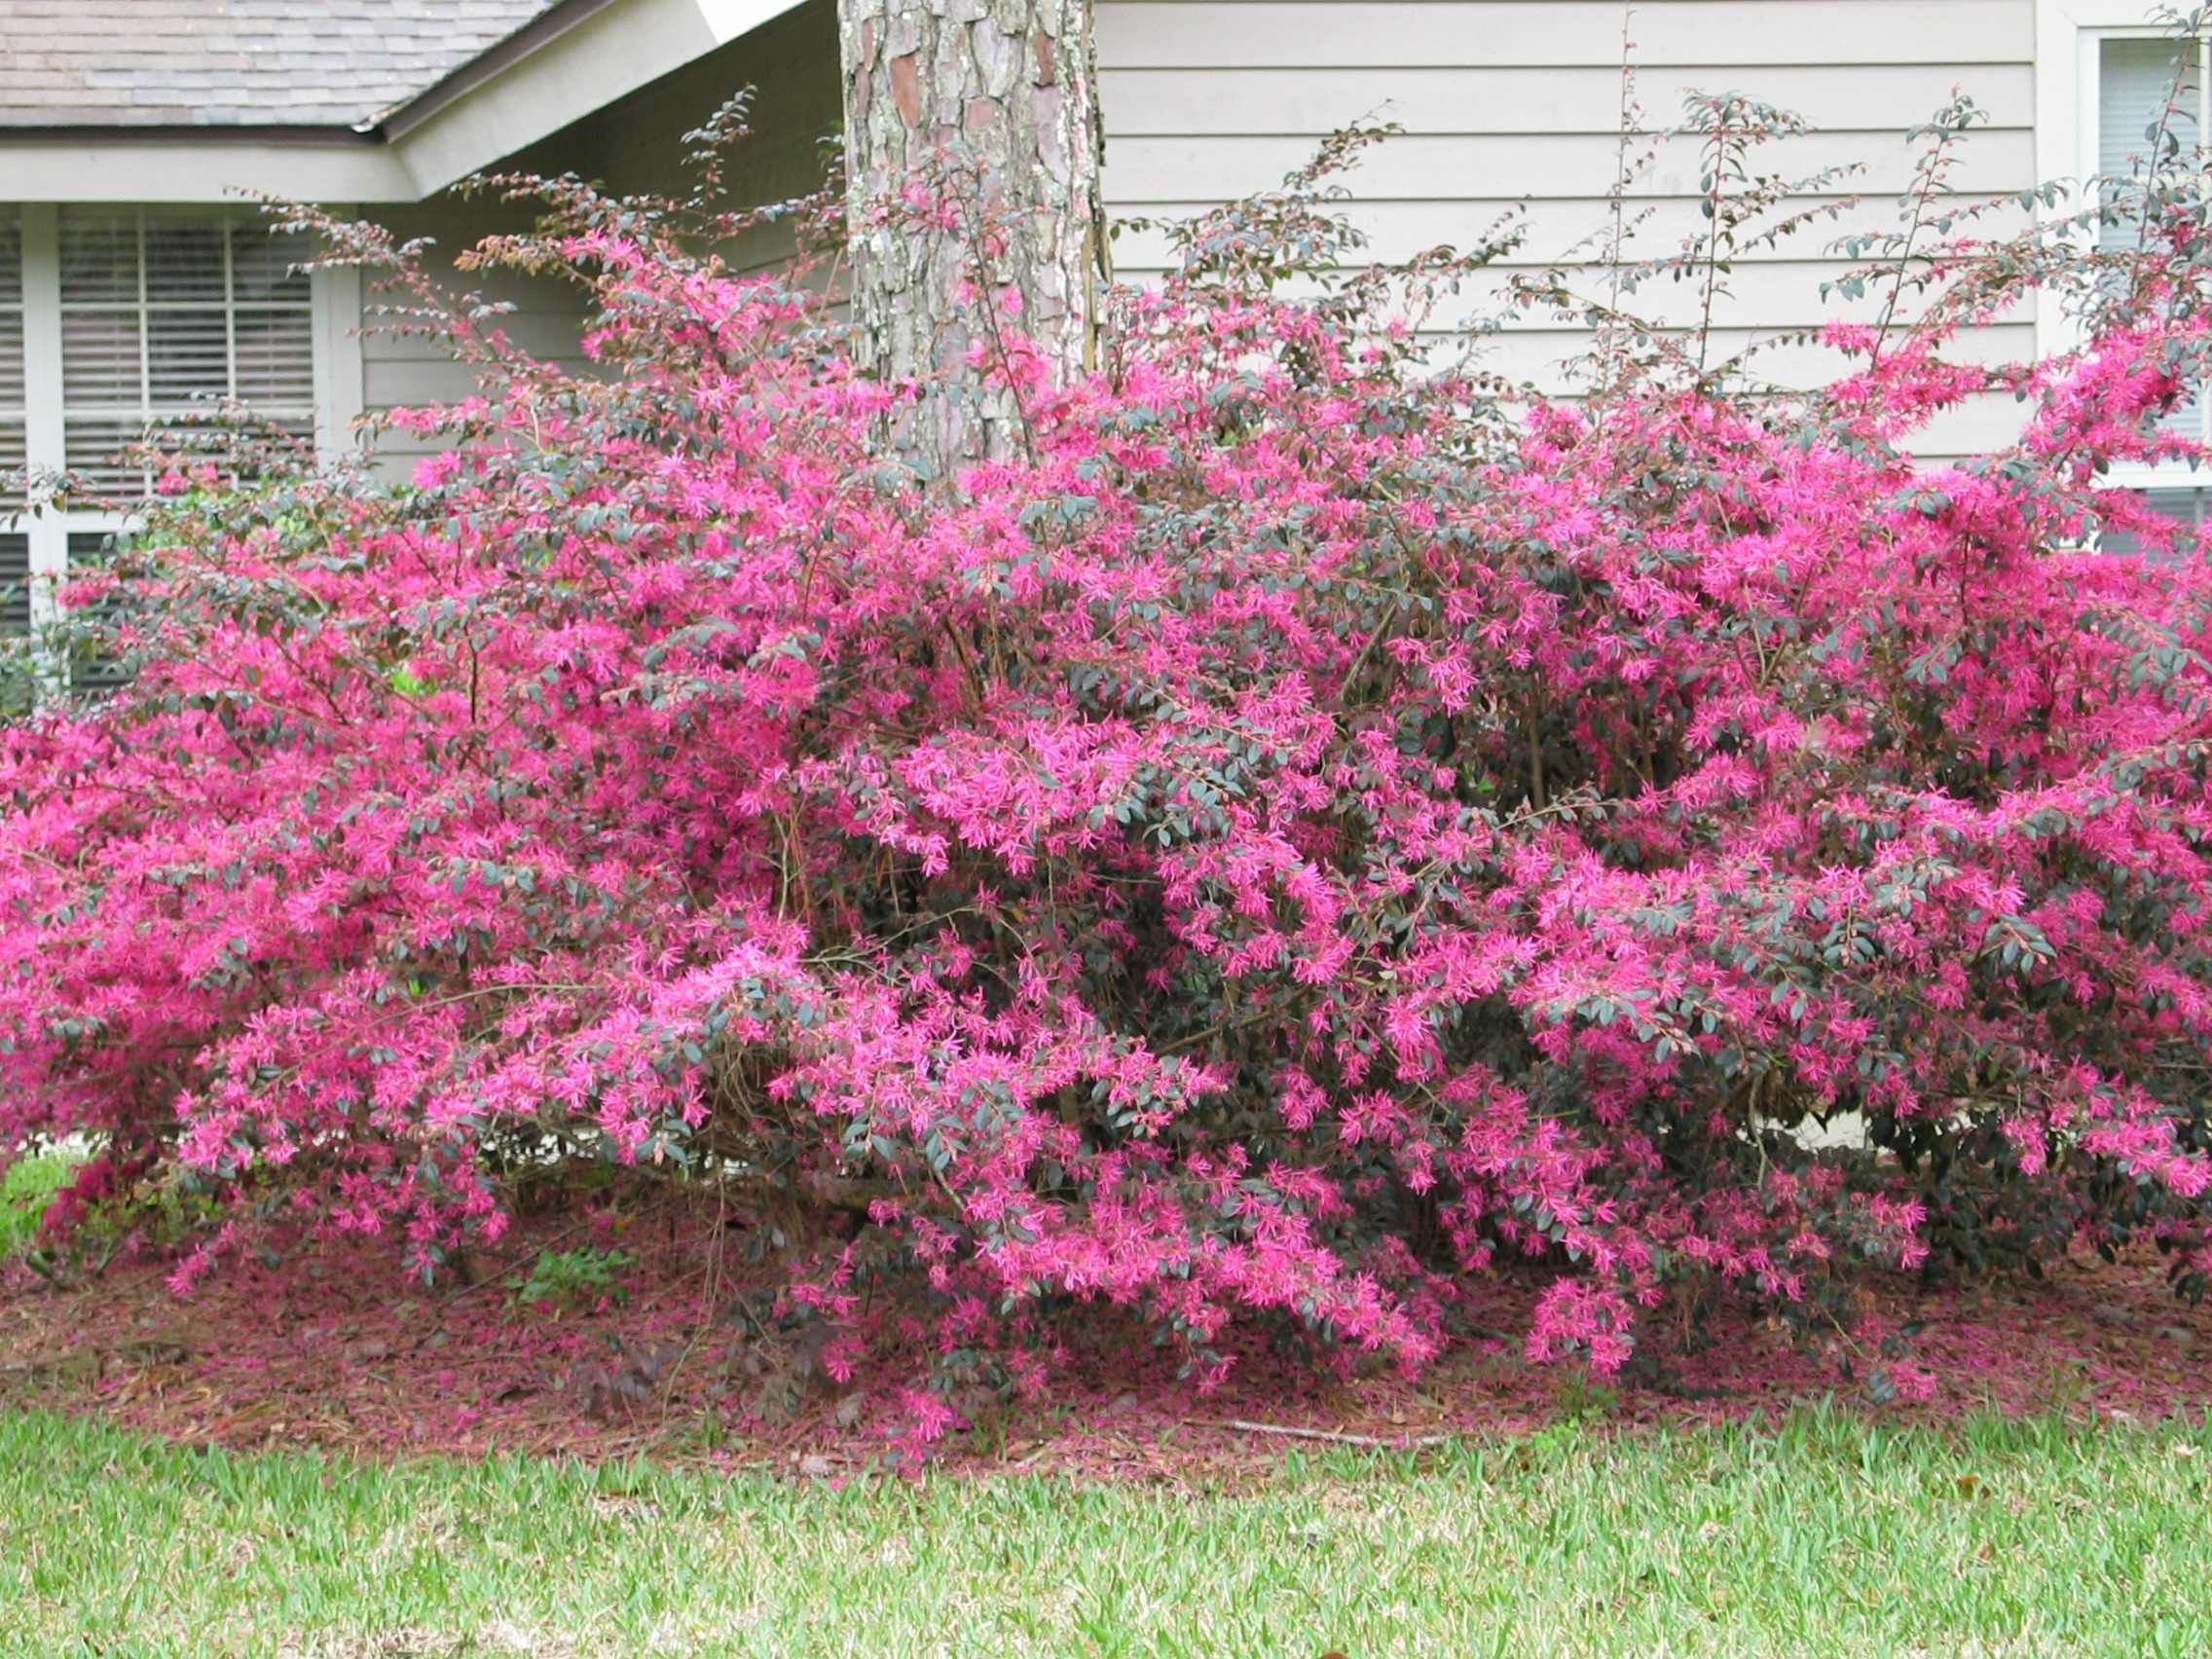 Shrubs to plant in fall - Loropetalum Or Chinese Fringe Flower My Favorite Landscaping Shrub Has Lovely Pink Flowers